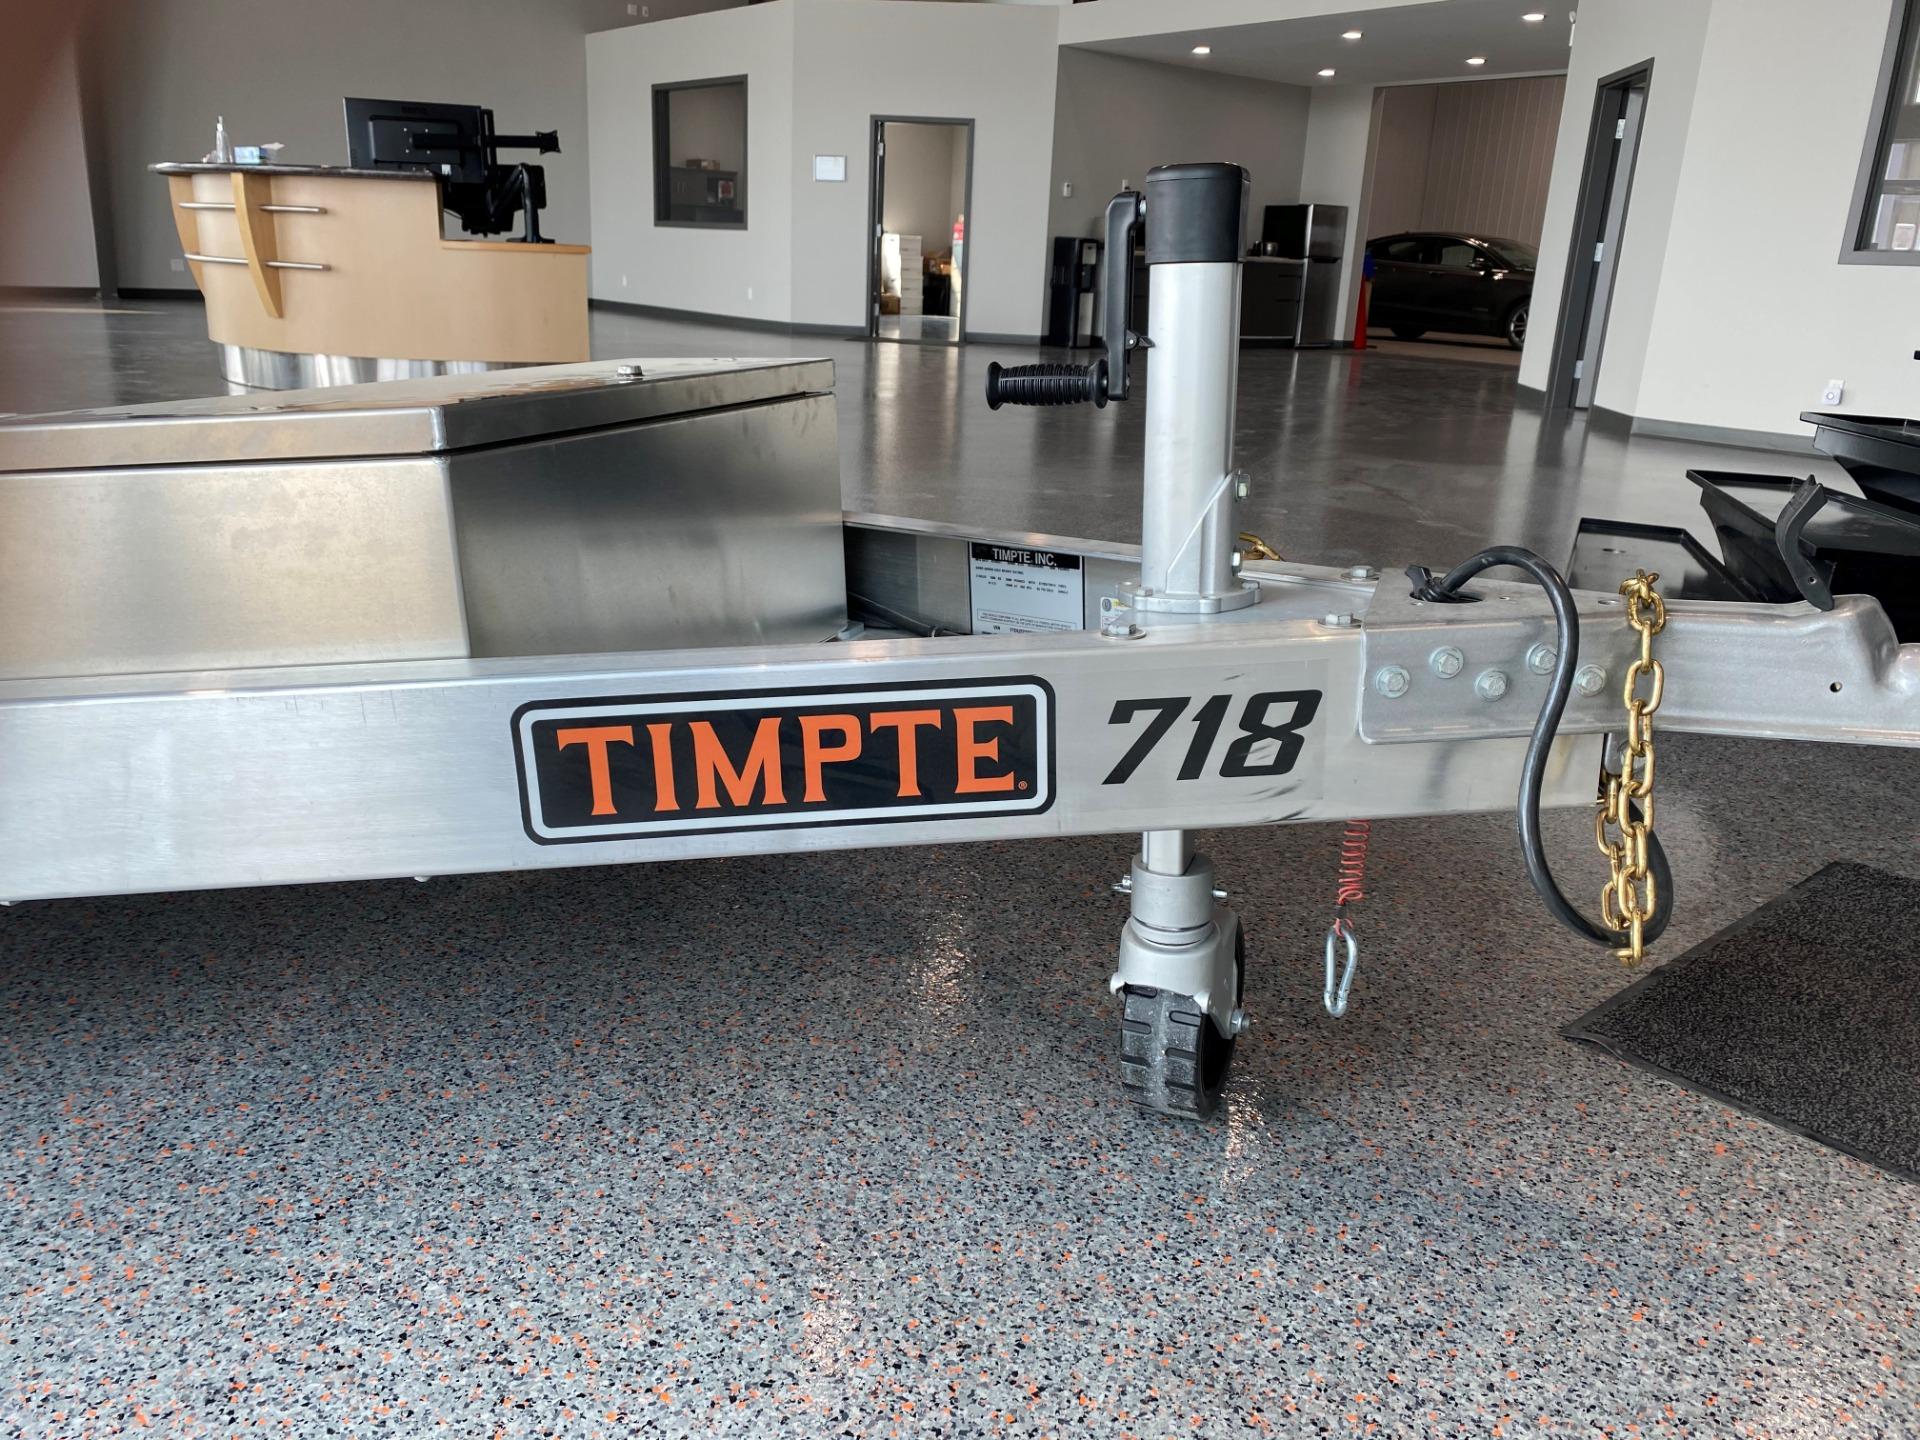 2022 Timpte 718 Utility Trailer for sale $12,900 at BP Motors in Morden MB R6M 1Y9 1